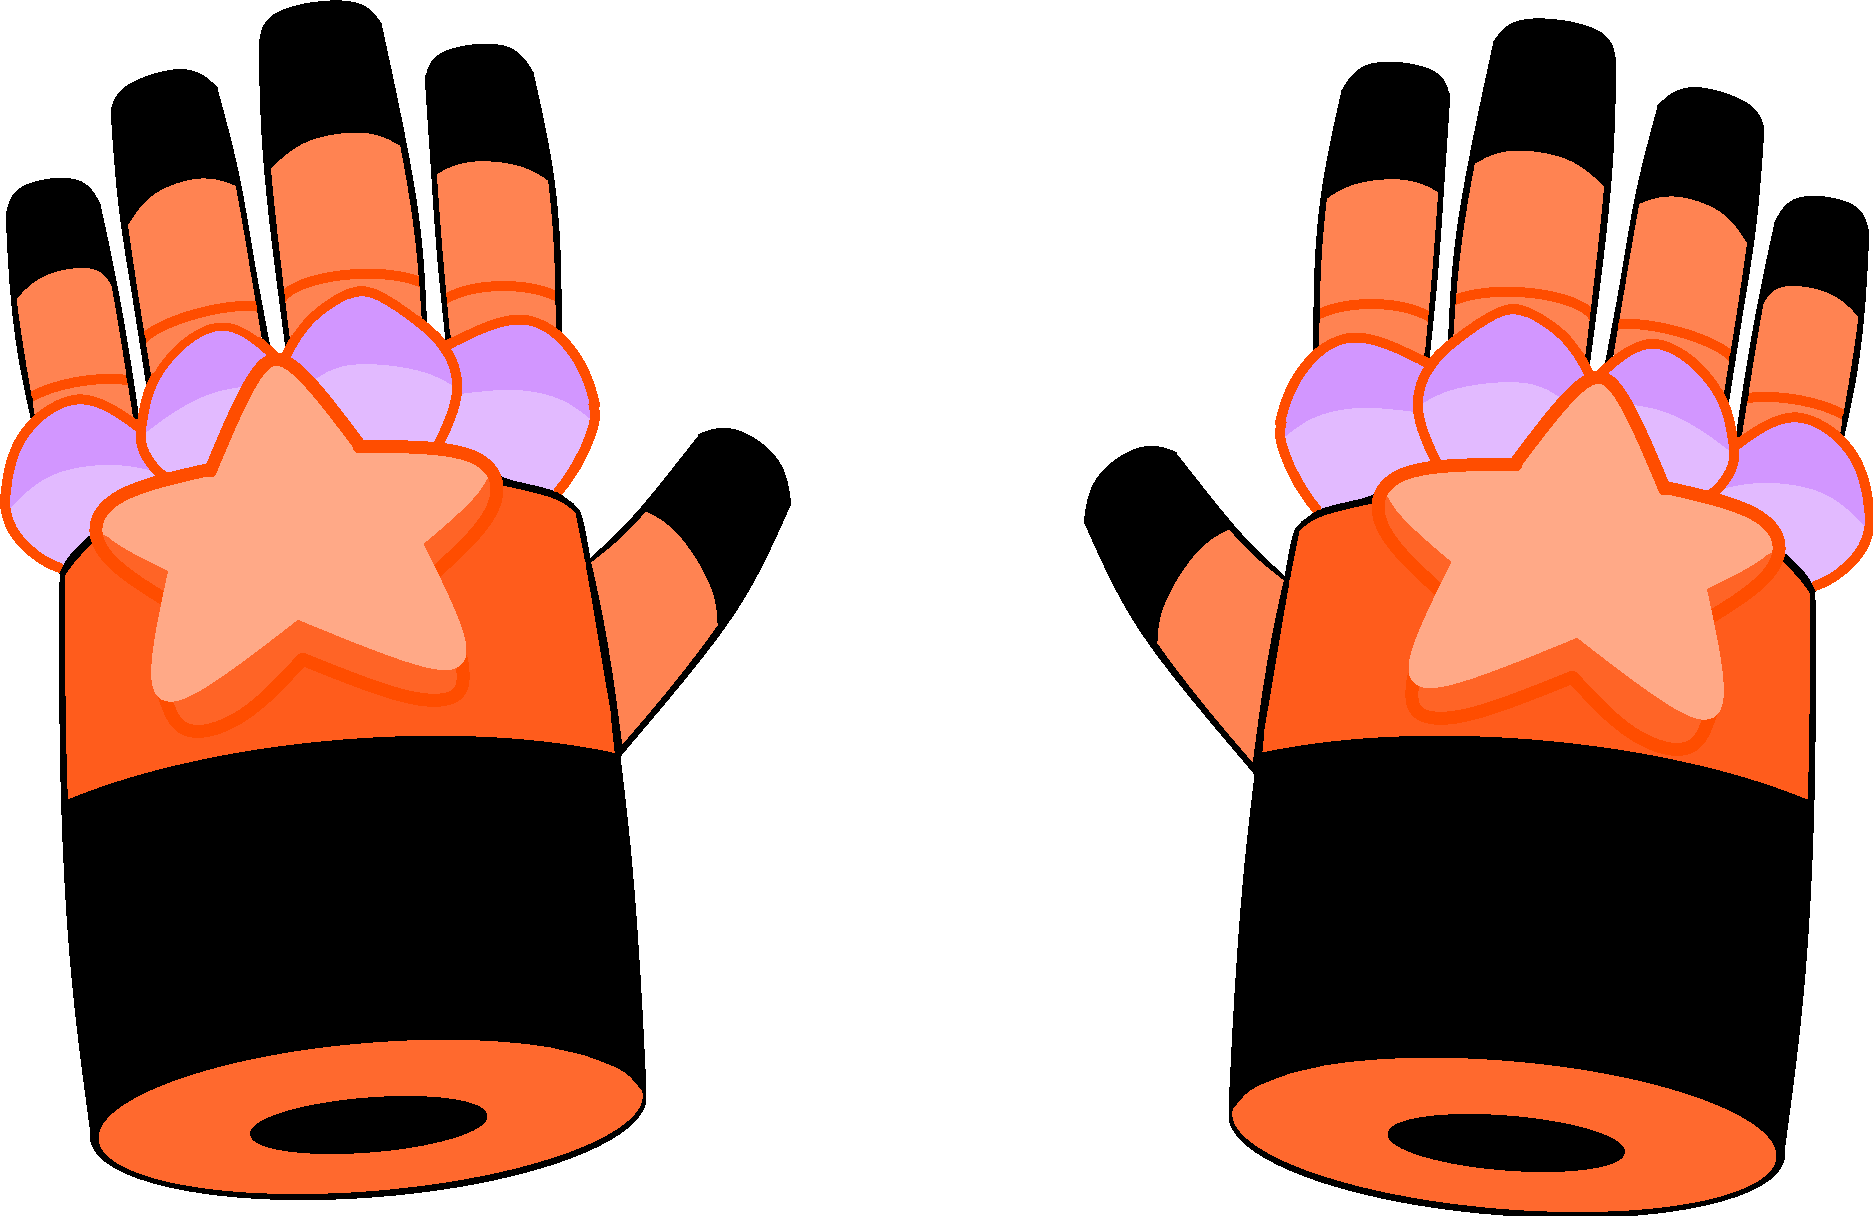 Image Sardonyx Gauntletspng Steven Universe Wiki Fandom Powered By Wikia